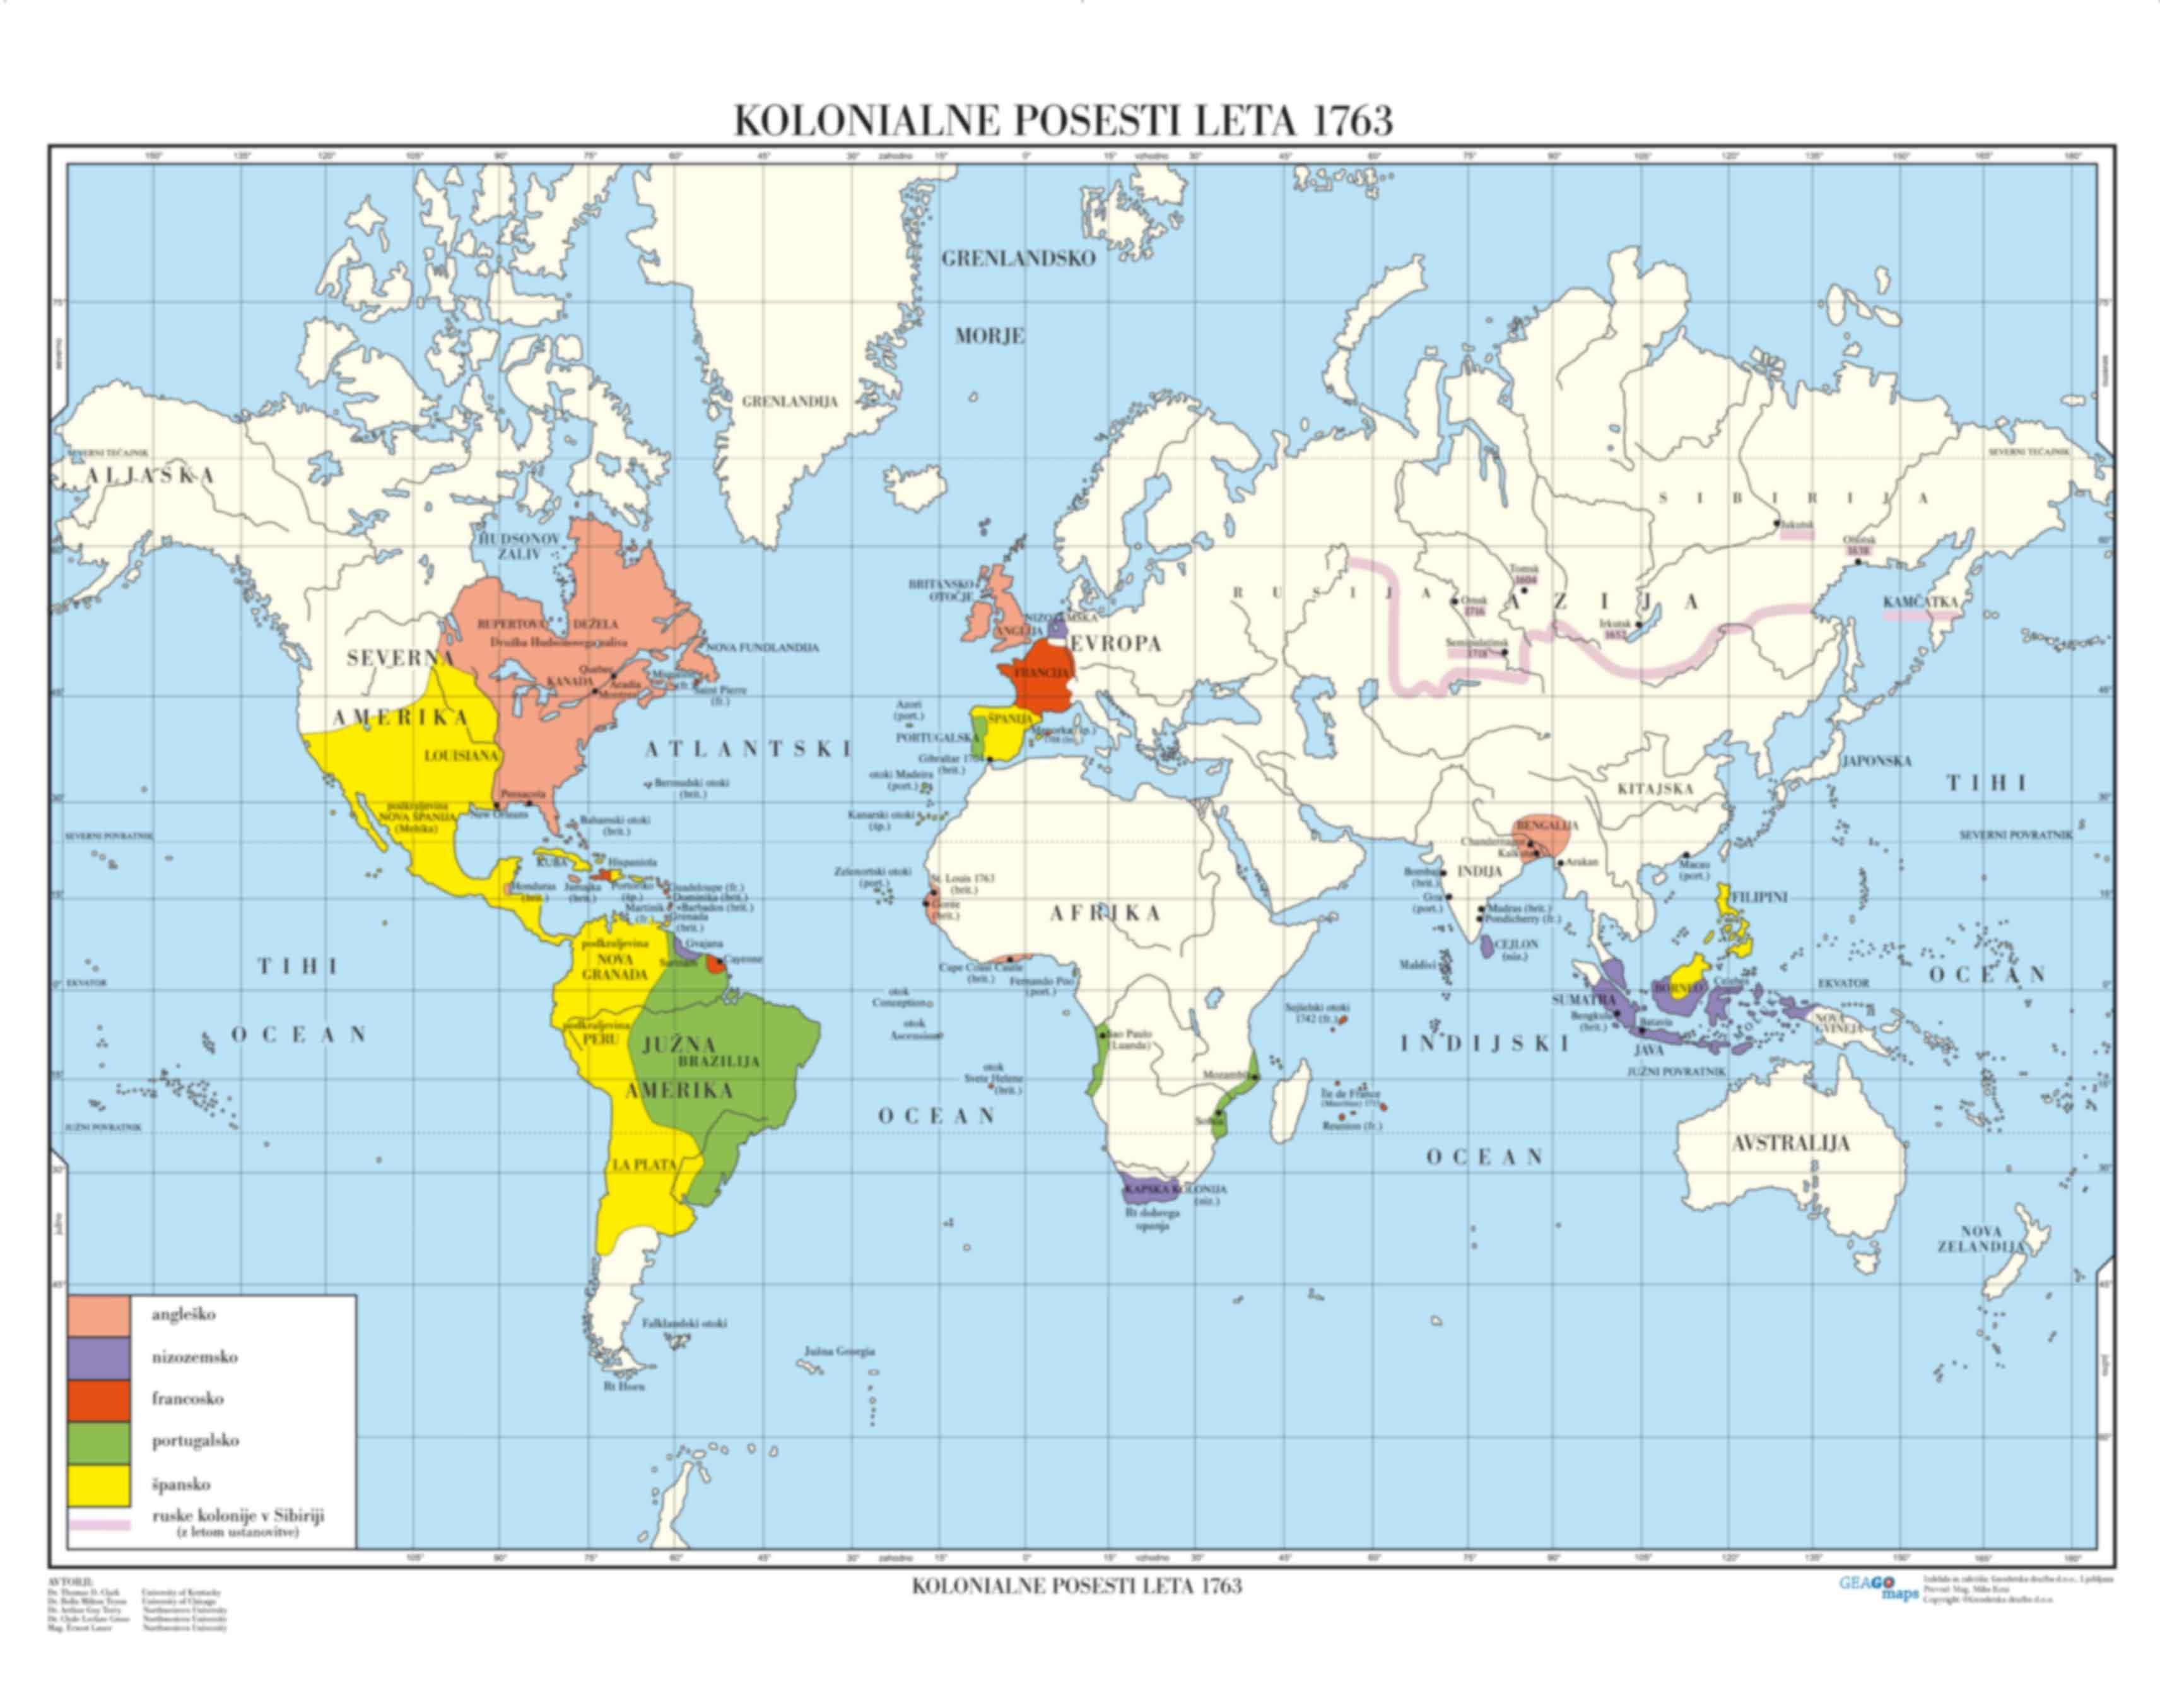 Kolonialne posesti leta 1763